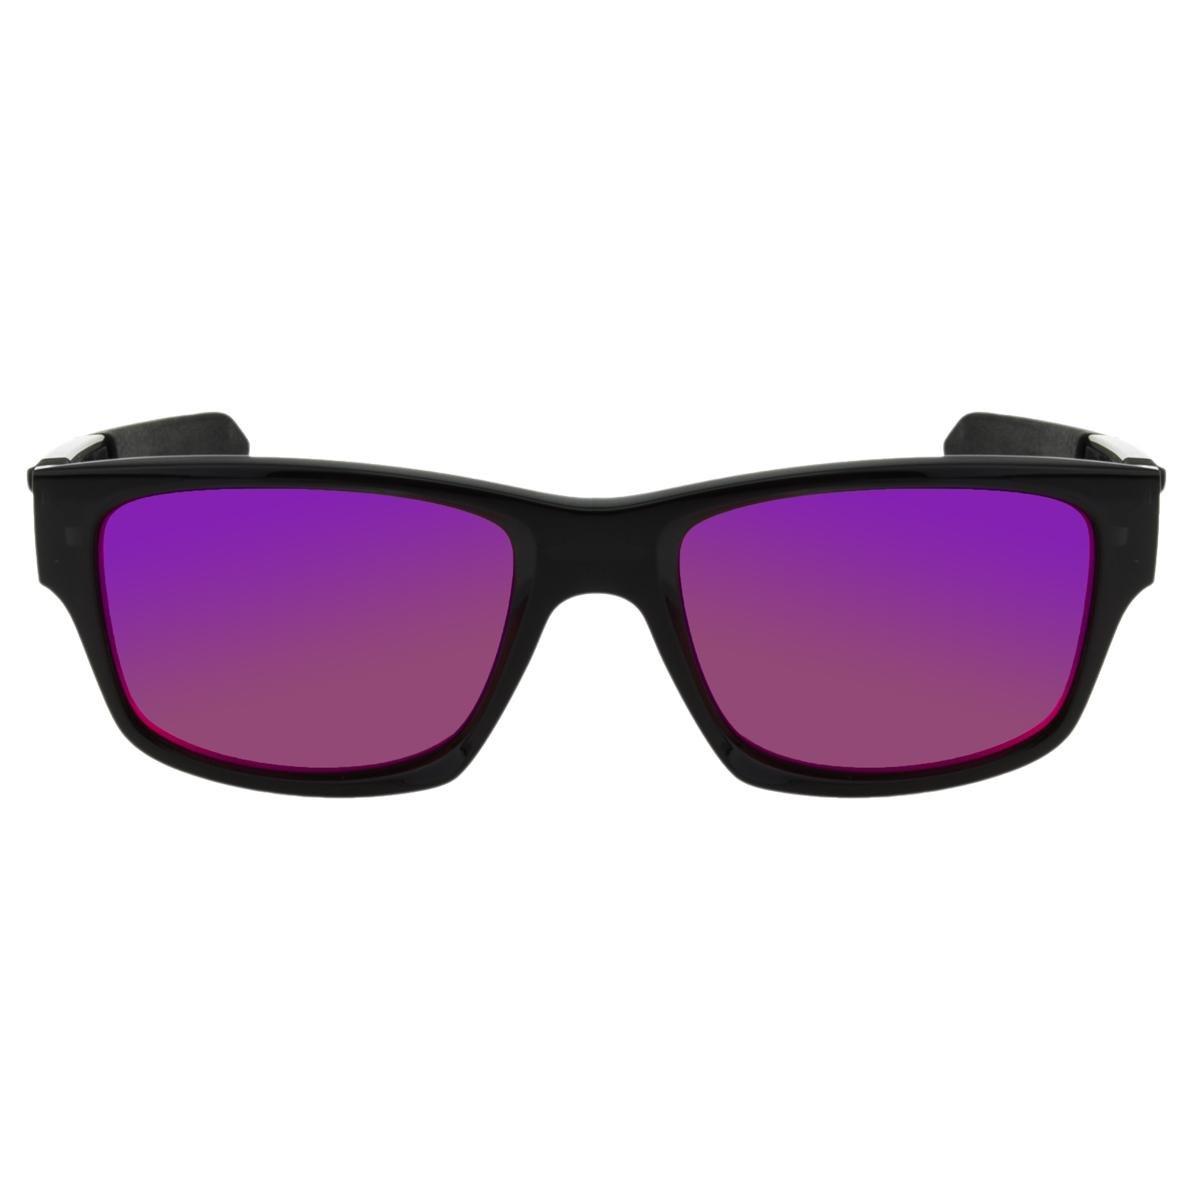 8cf3c677ef939 Óculos de Sol Oakley Jupiter Squared OO9135P - Black Ink Red Iridium  Polarized - Compre Agora